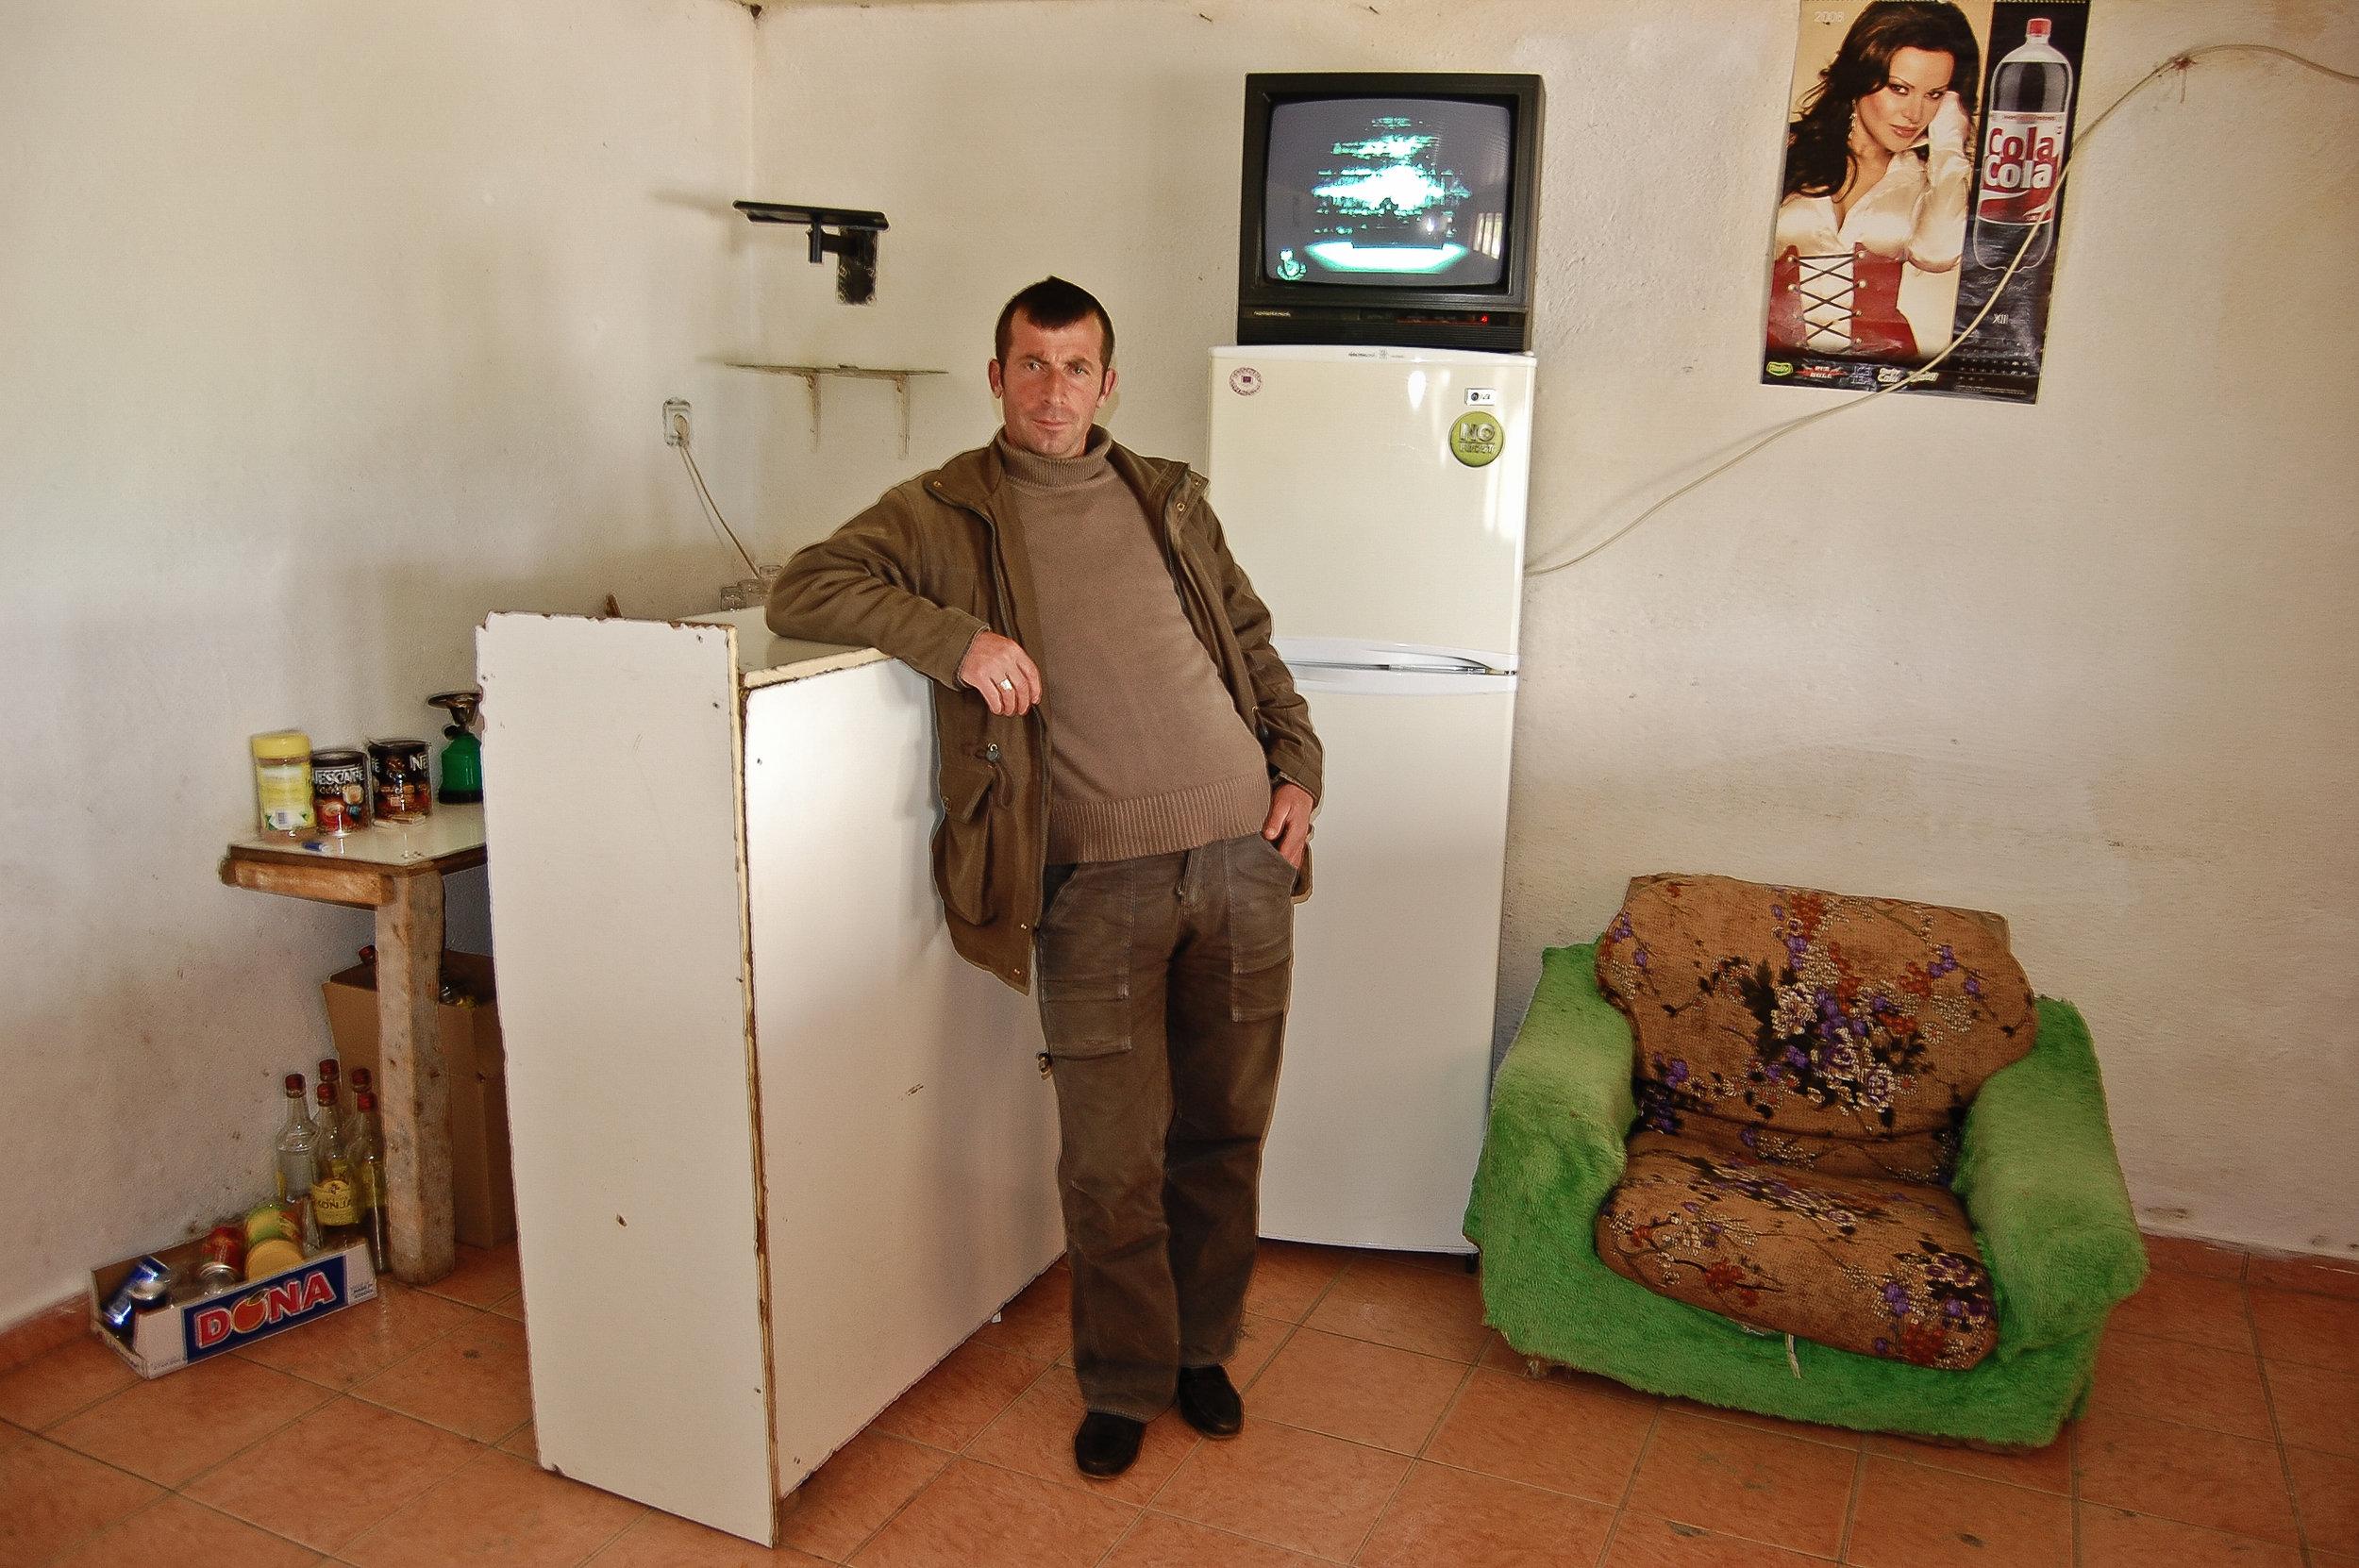 PW_090507_Albania_202.jpg